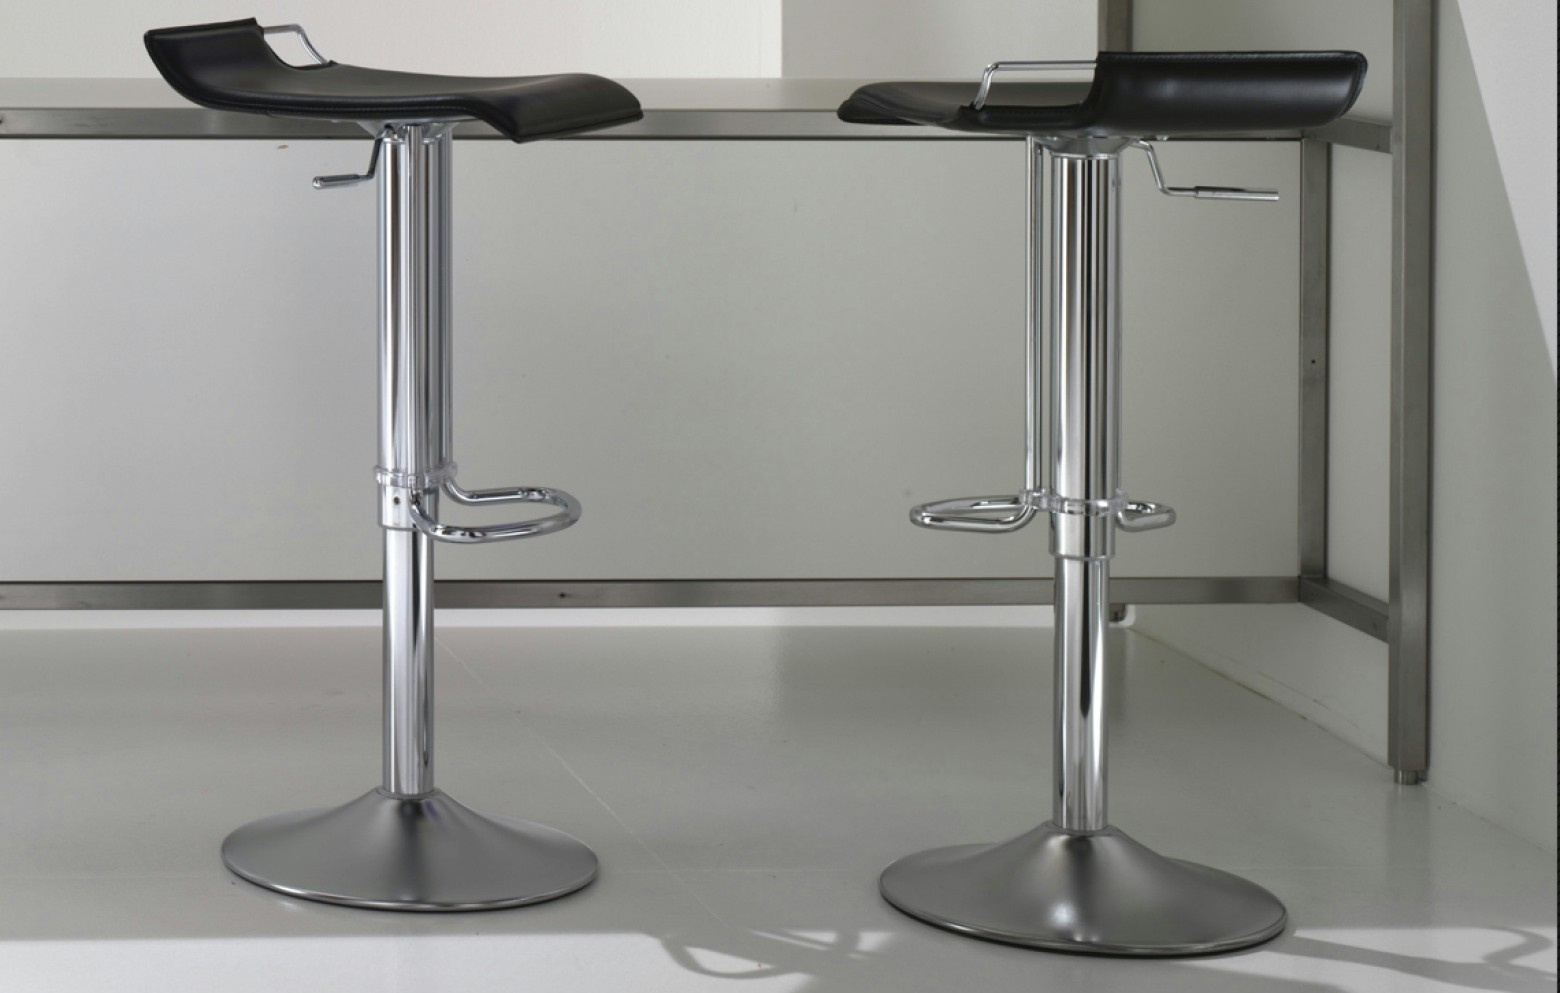 designer barhocker hoppy bei who 39 s perfect g nstig kaufen. Black Bedroom Furniture Sets. Home Design Ideas